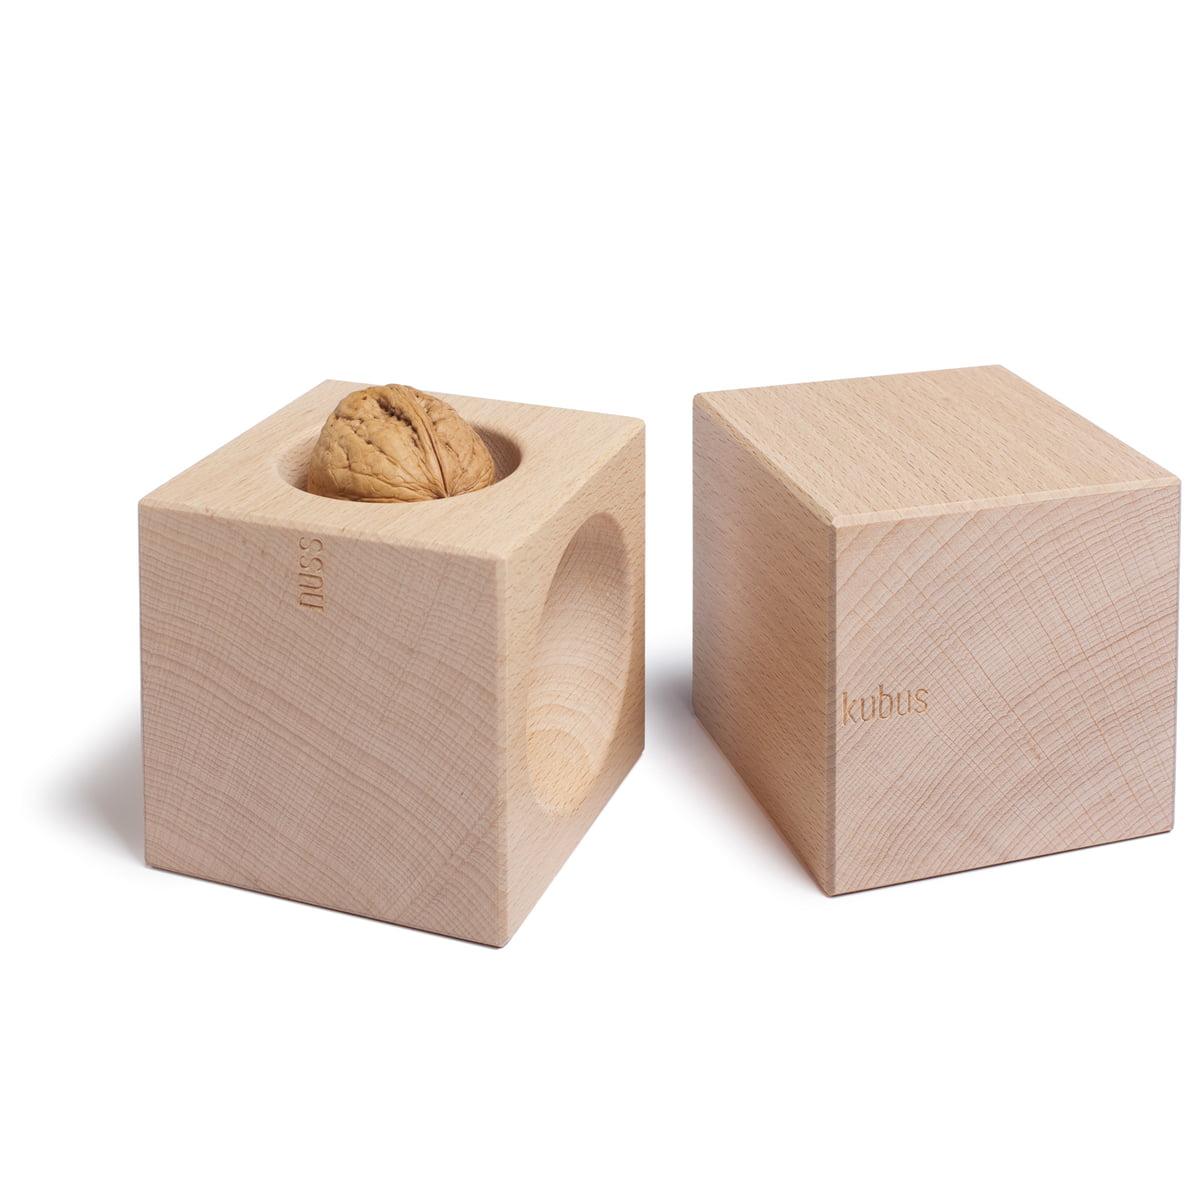 nusskubus nussknacker siebensachen shop. Black Bedroom Furniture Sets. Home Design Ideas